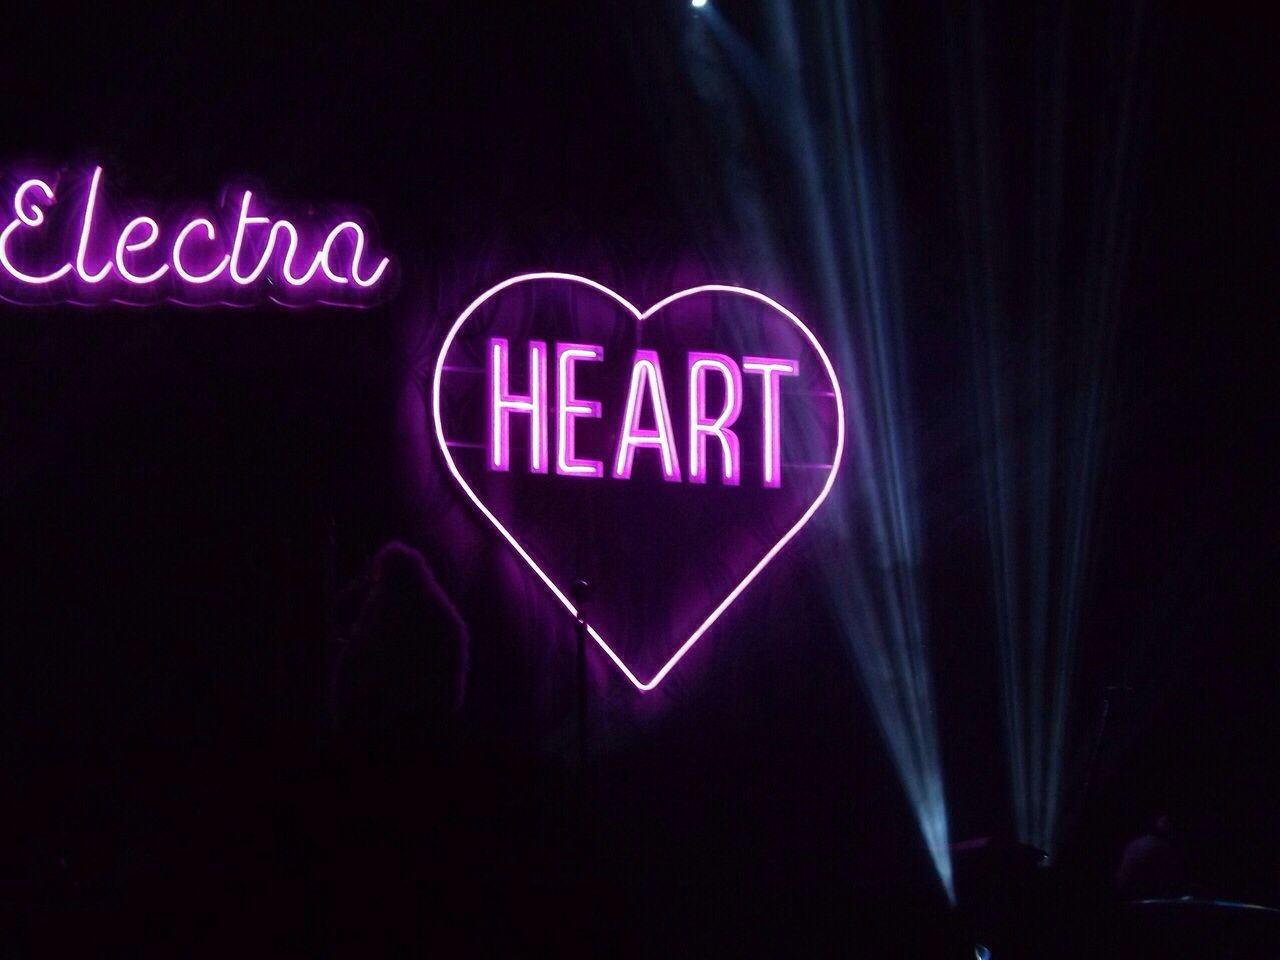 neon lights - electra heart